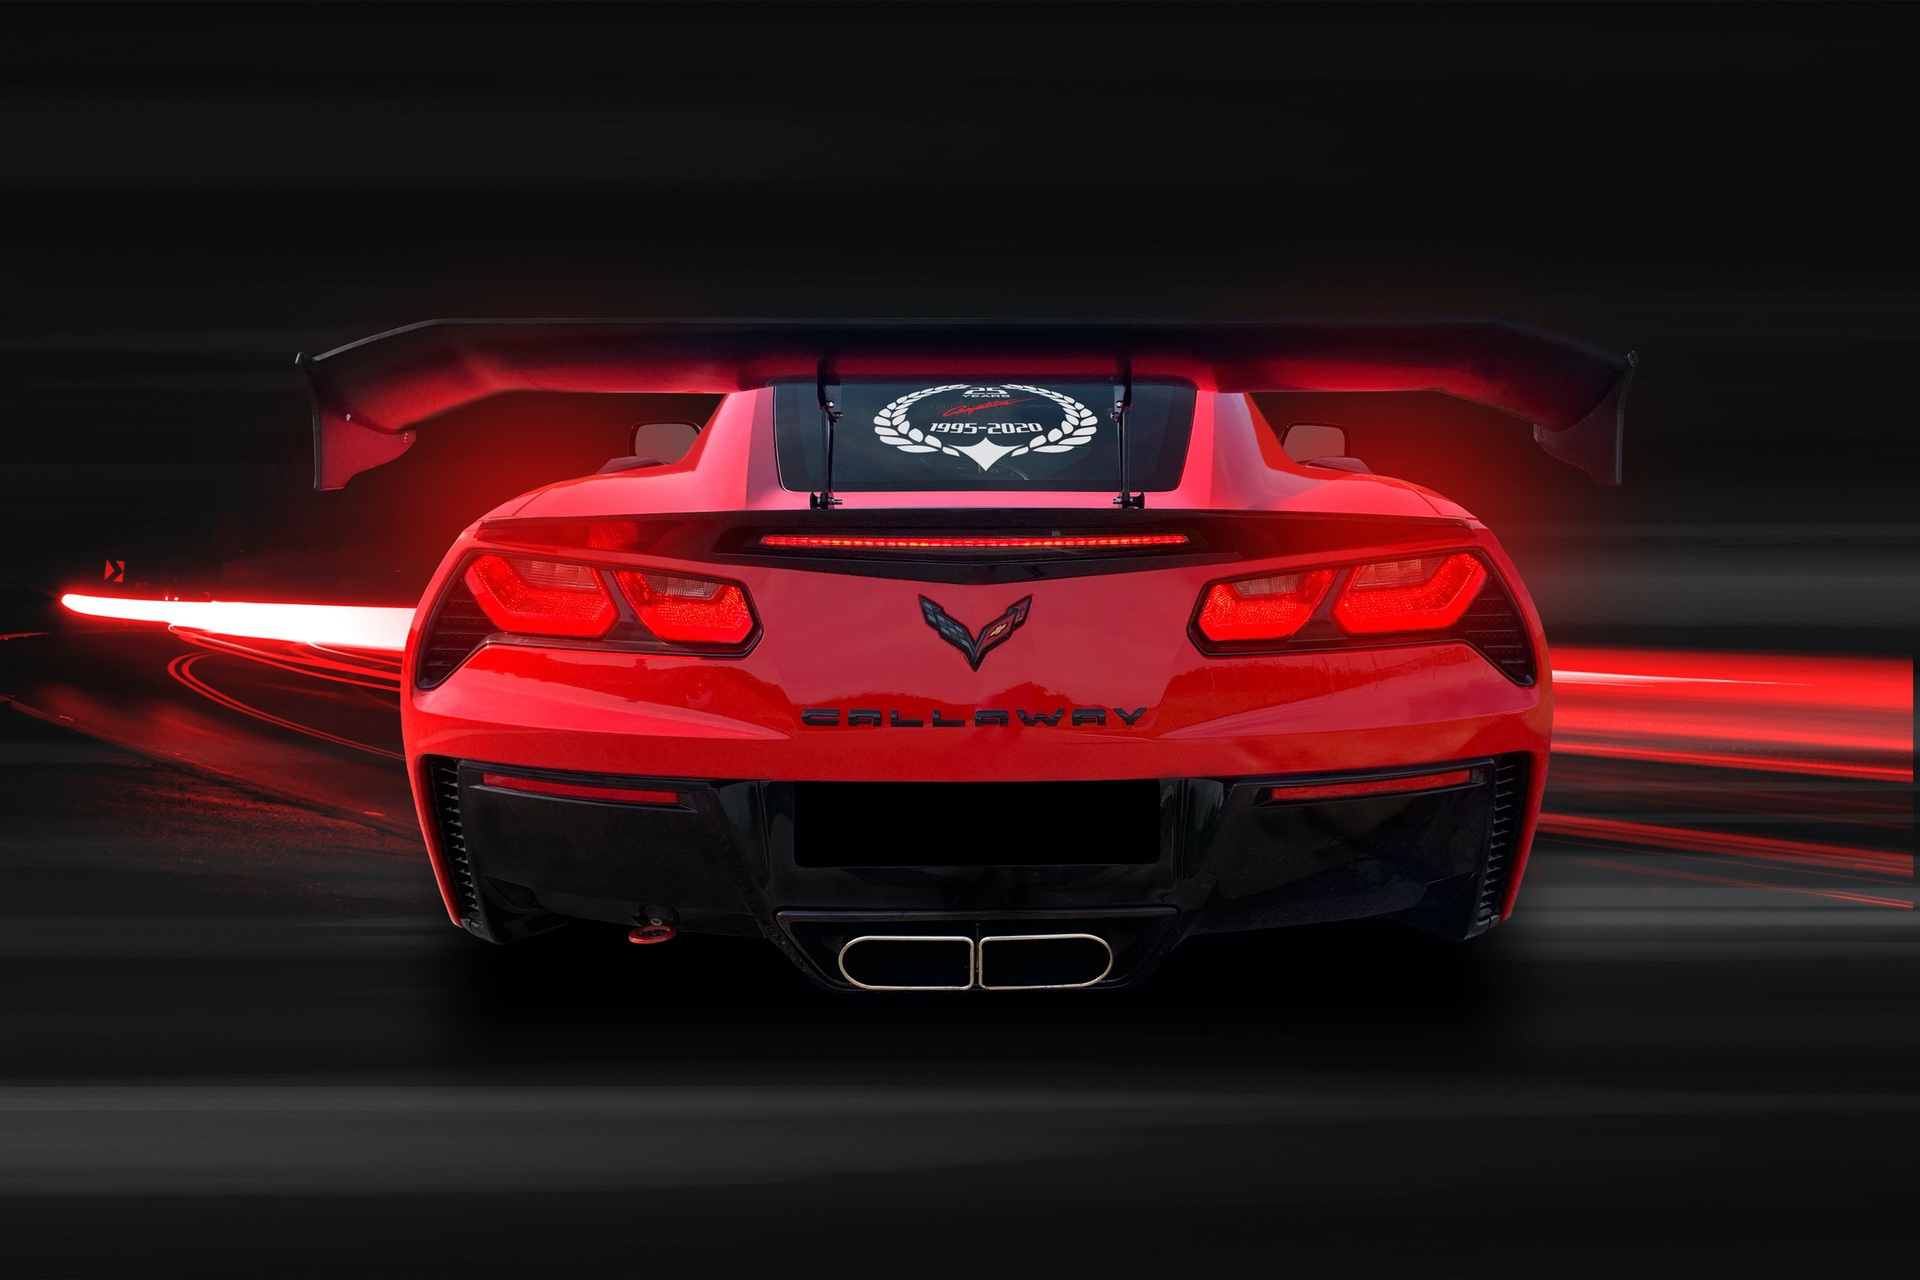 Callaway_C7_Corvette_limited_edition_0006